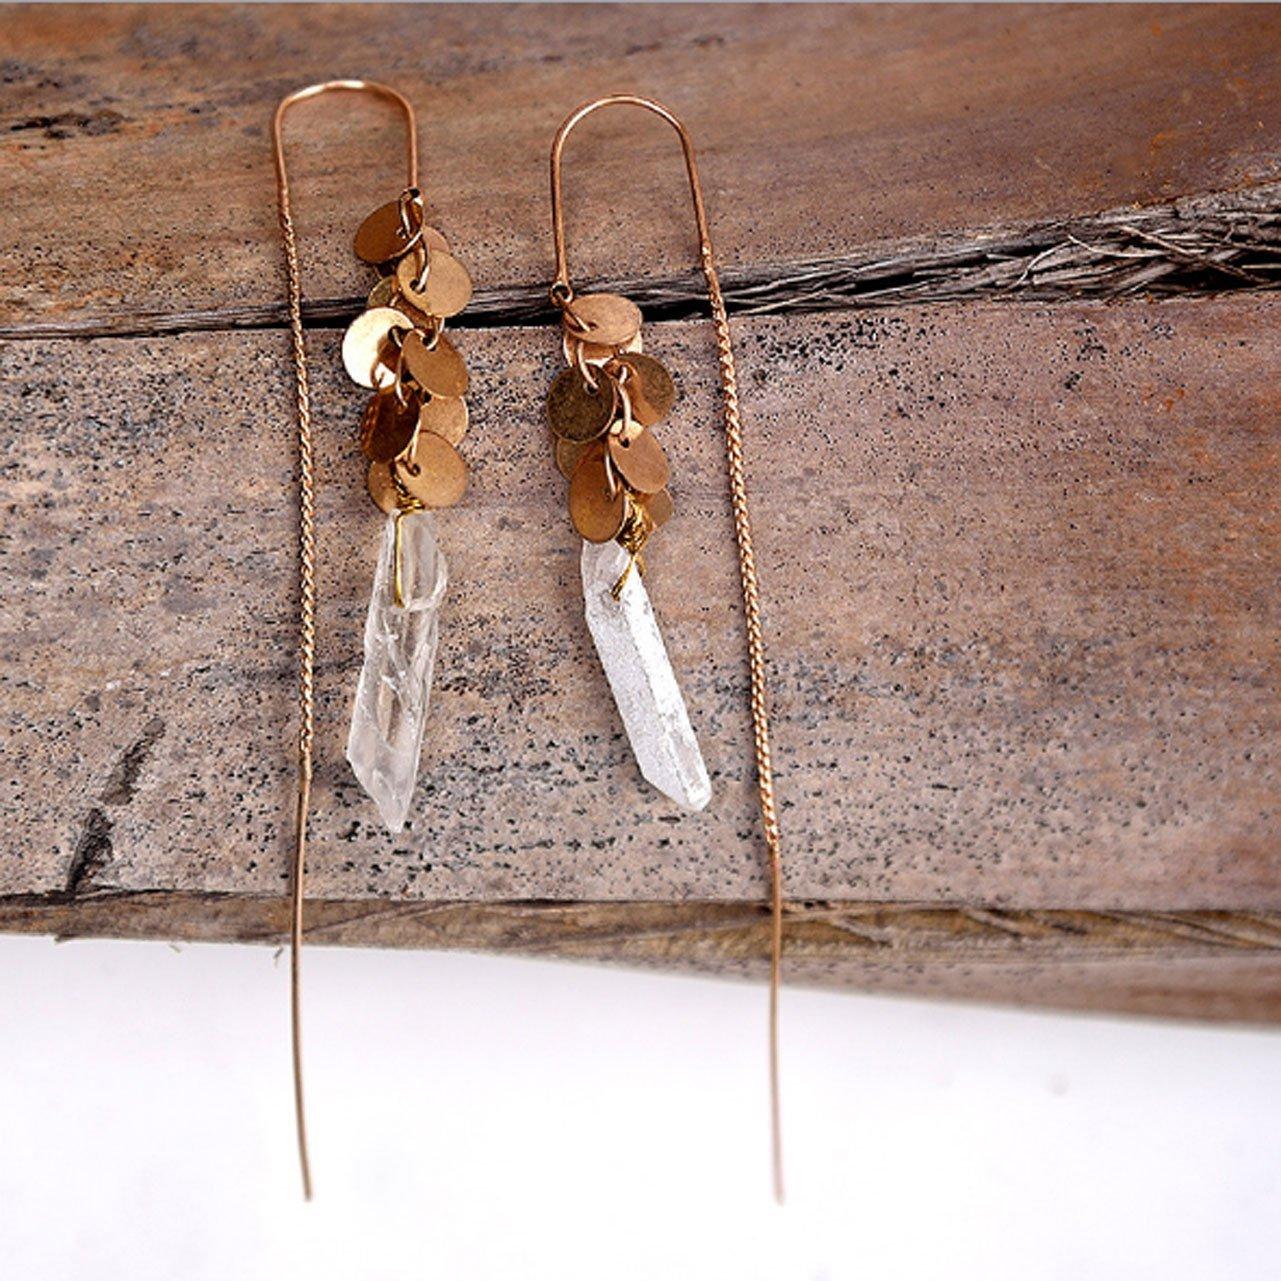 Natural Stone Pendant Earrings Long Grape Shape Metal pendant Earrings For Women